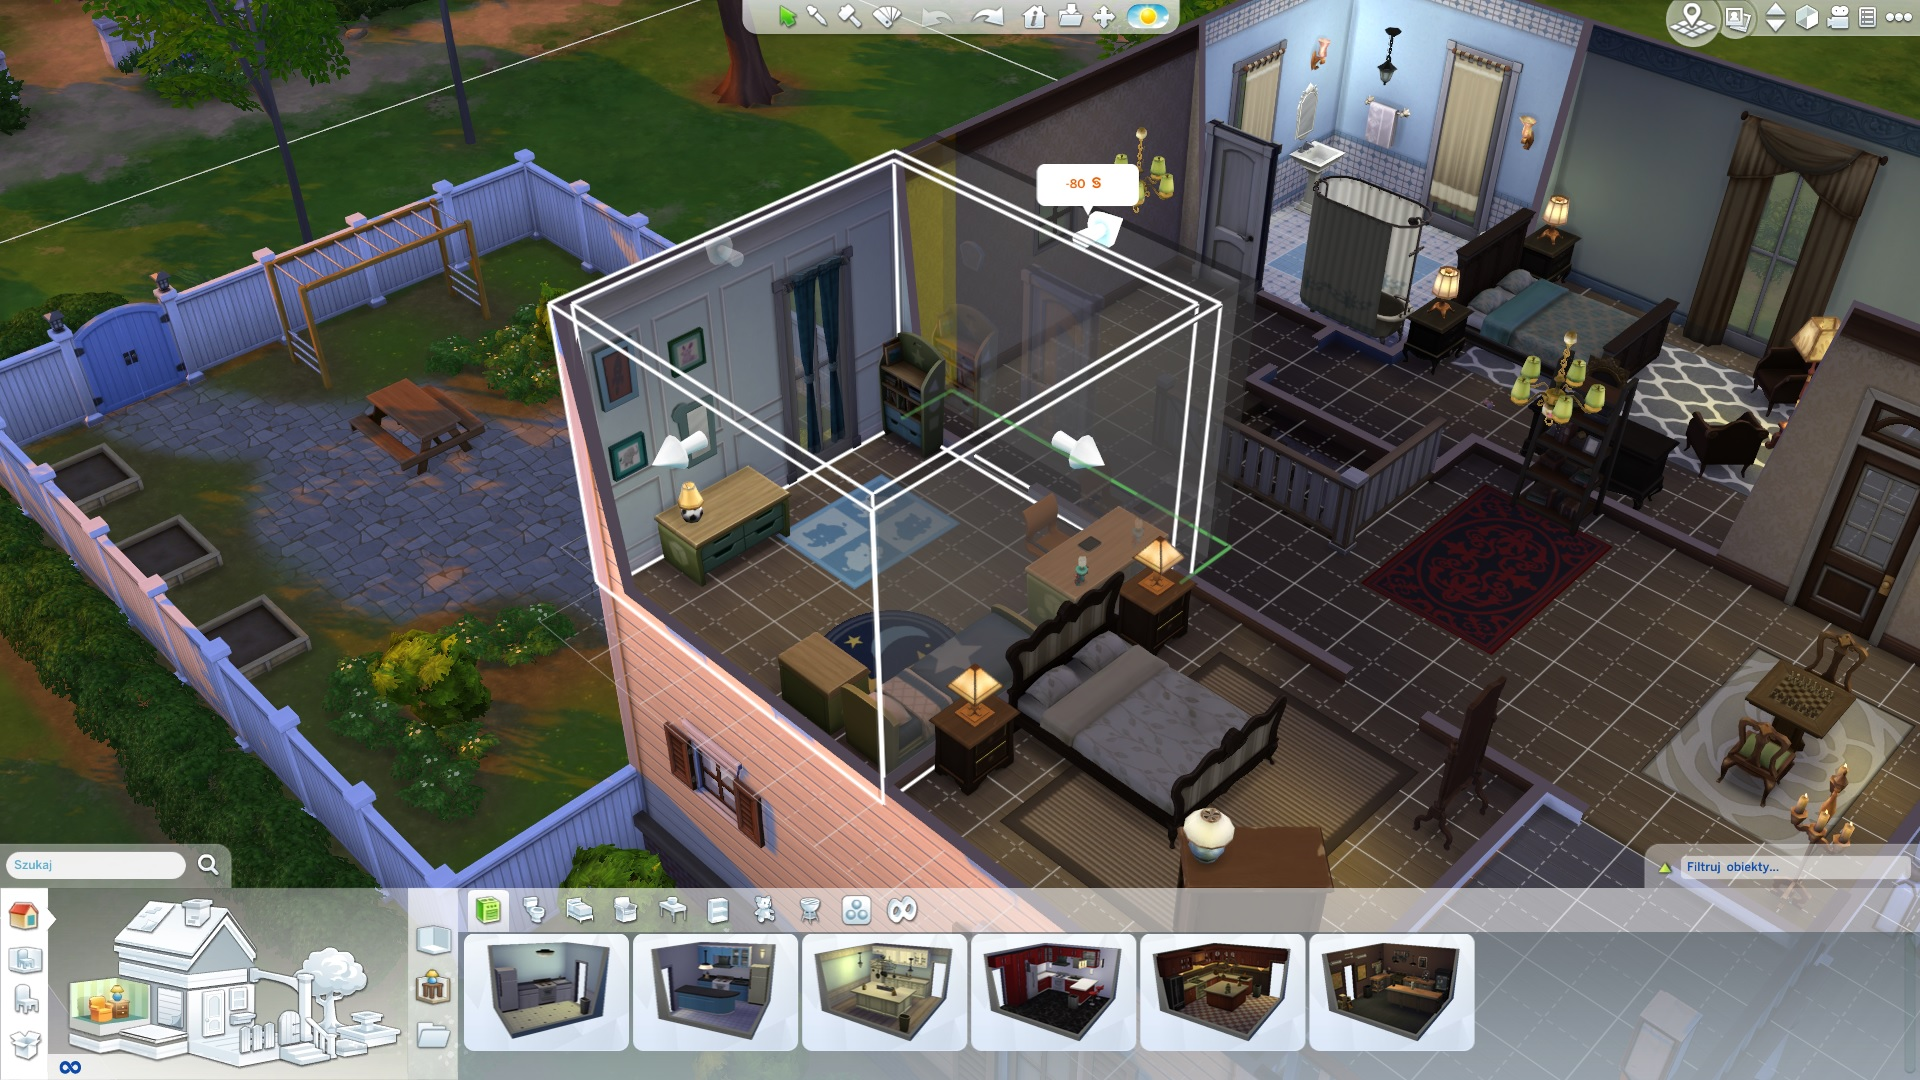 the sims 4 - rozbudowa domu